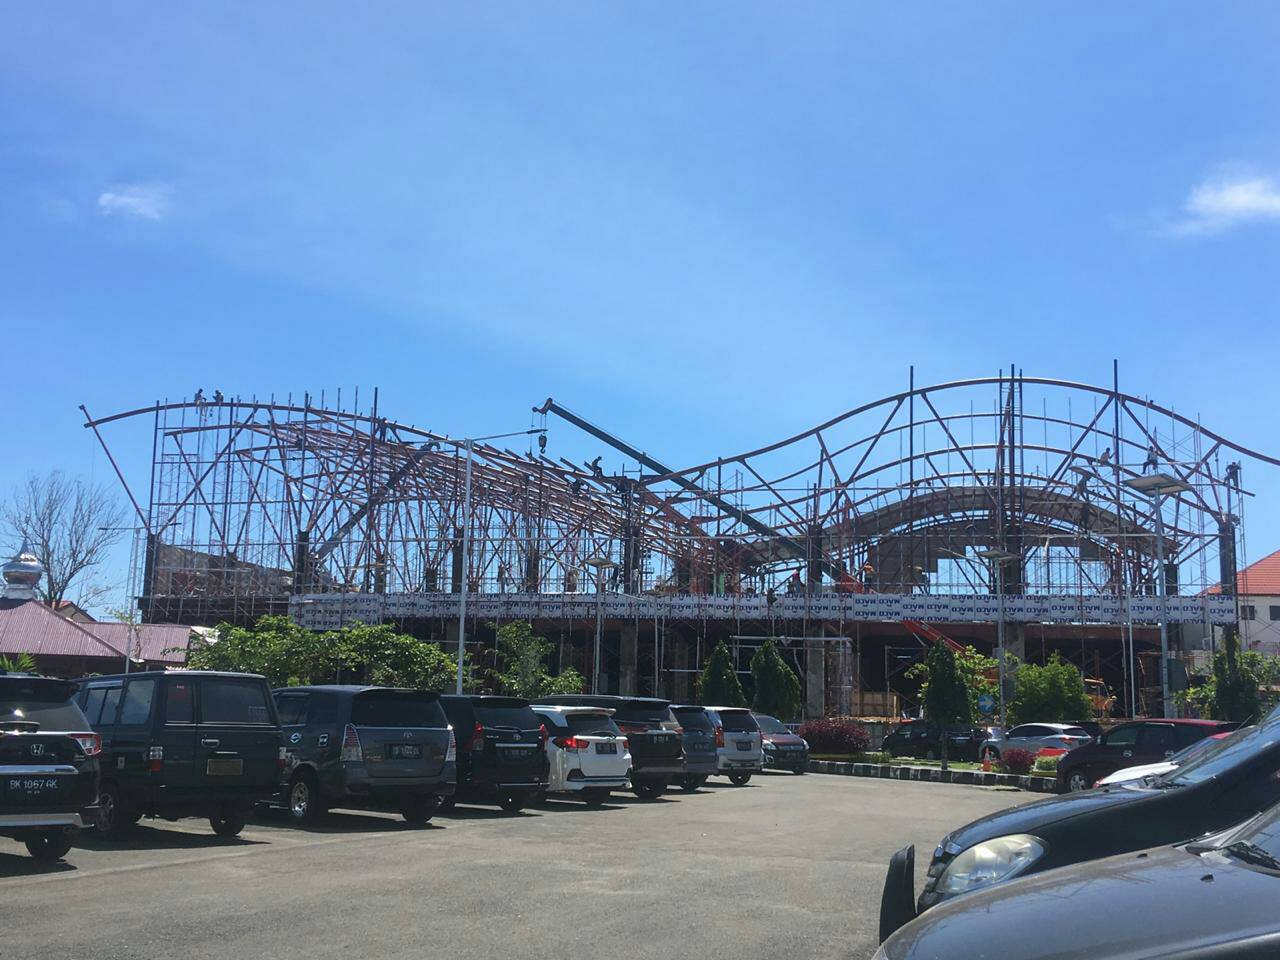 Proses pembangunan Bandara Fatmawati Soekarno sudah dimulai sejak awal tahun 2019.